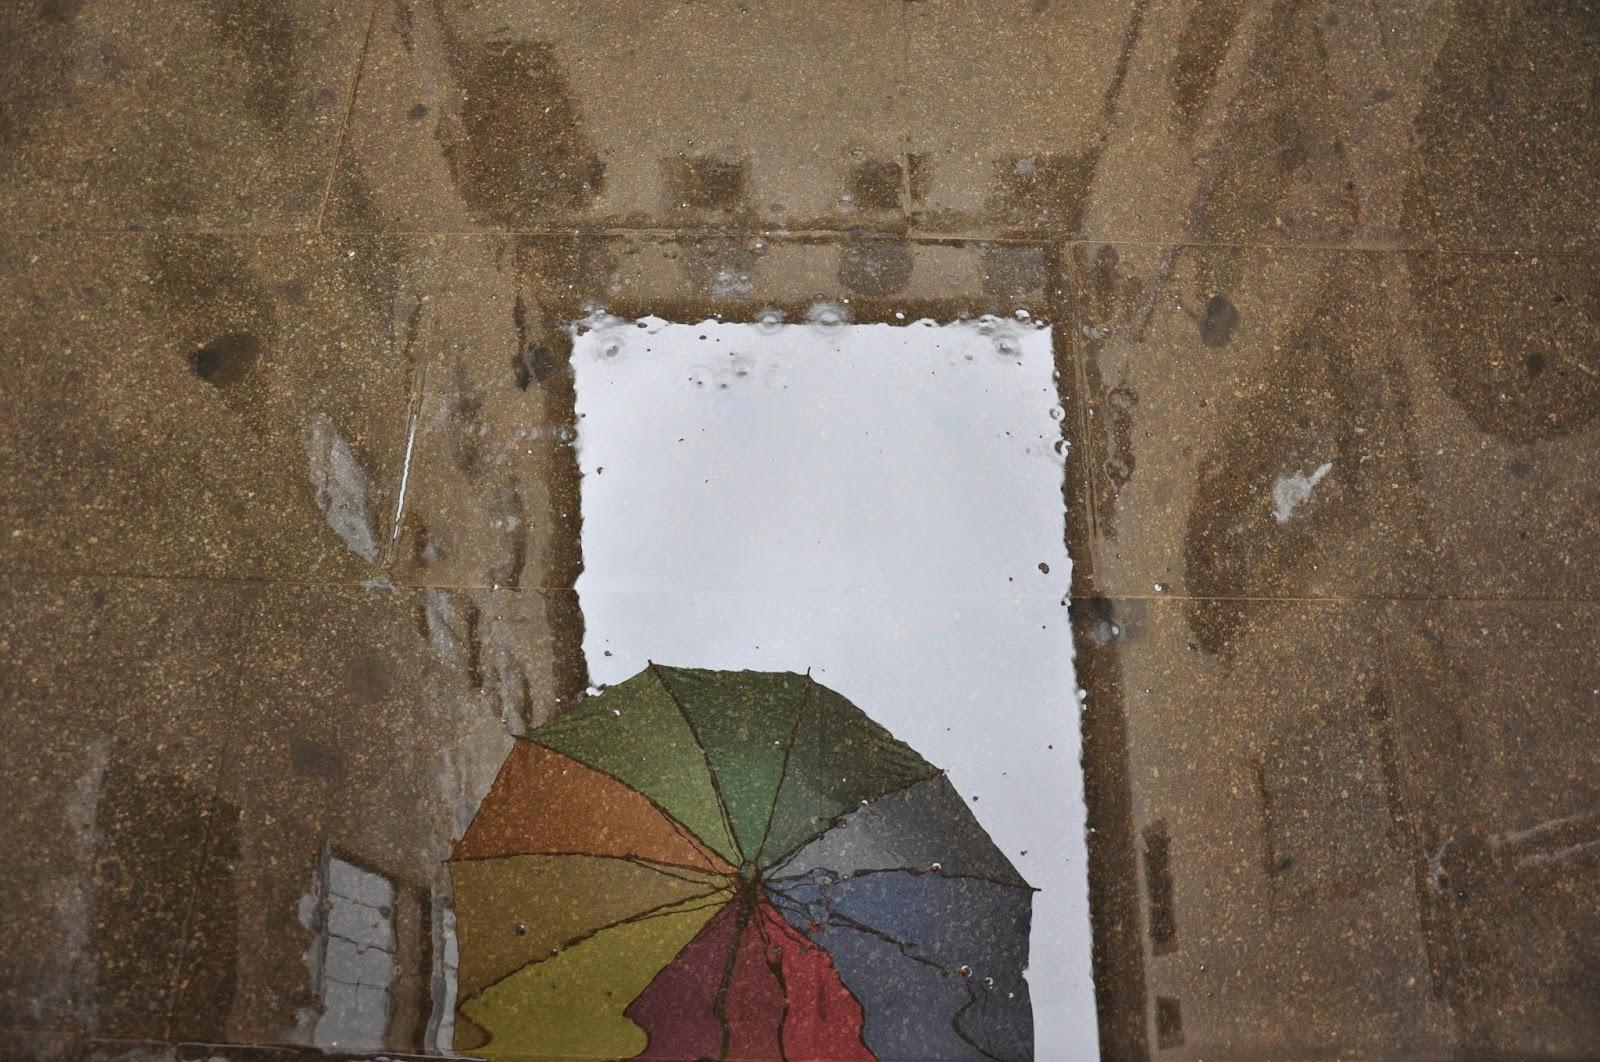 umbrella reflection puddle courtyard palazzo Vicenza